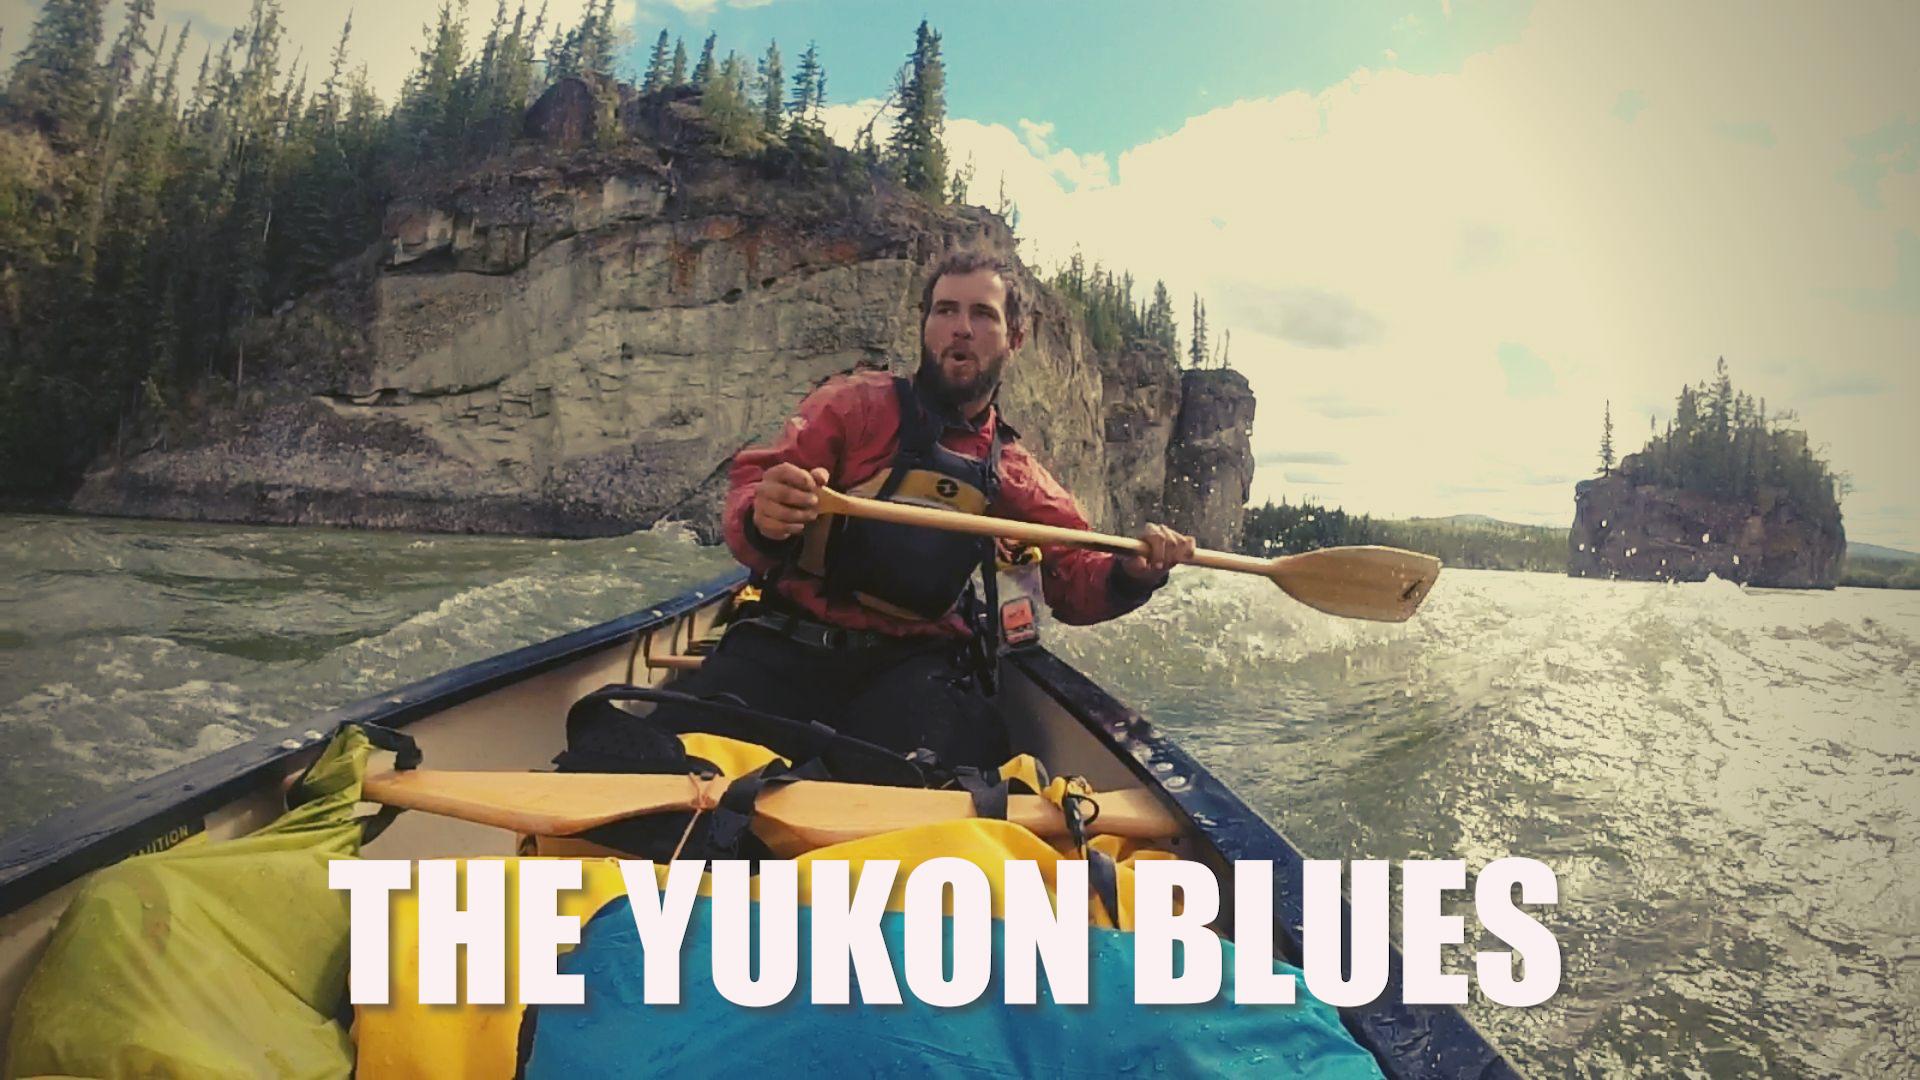 The Yukon Blues